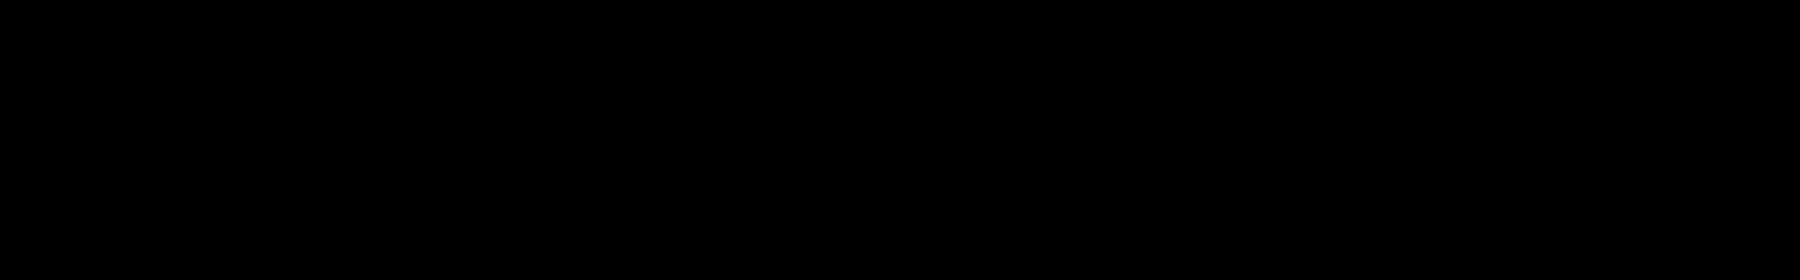 Riemann Techno Massive Presets 1 audio waveform